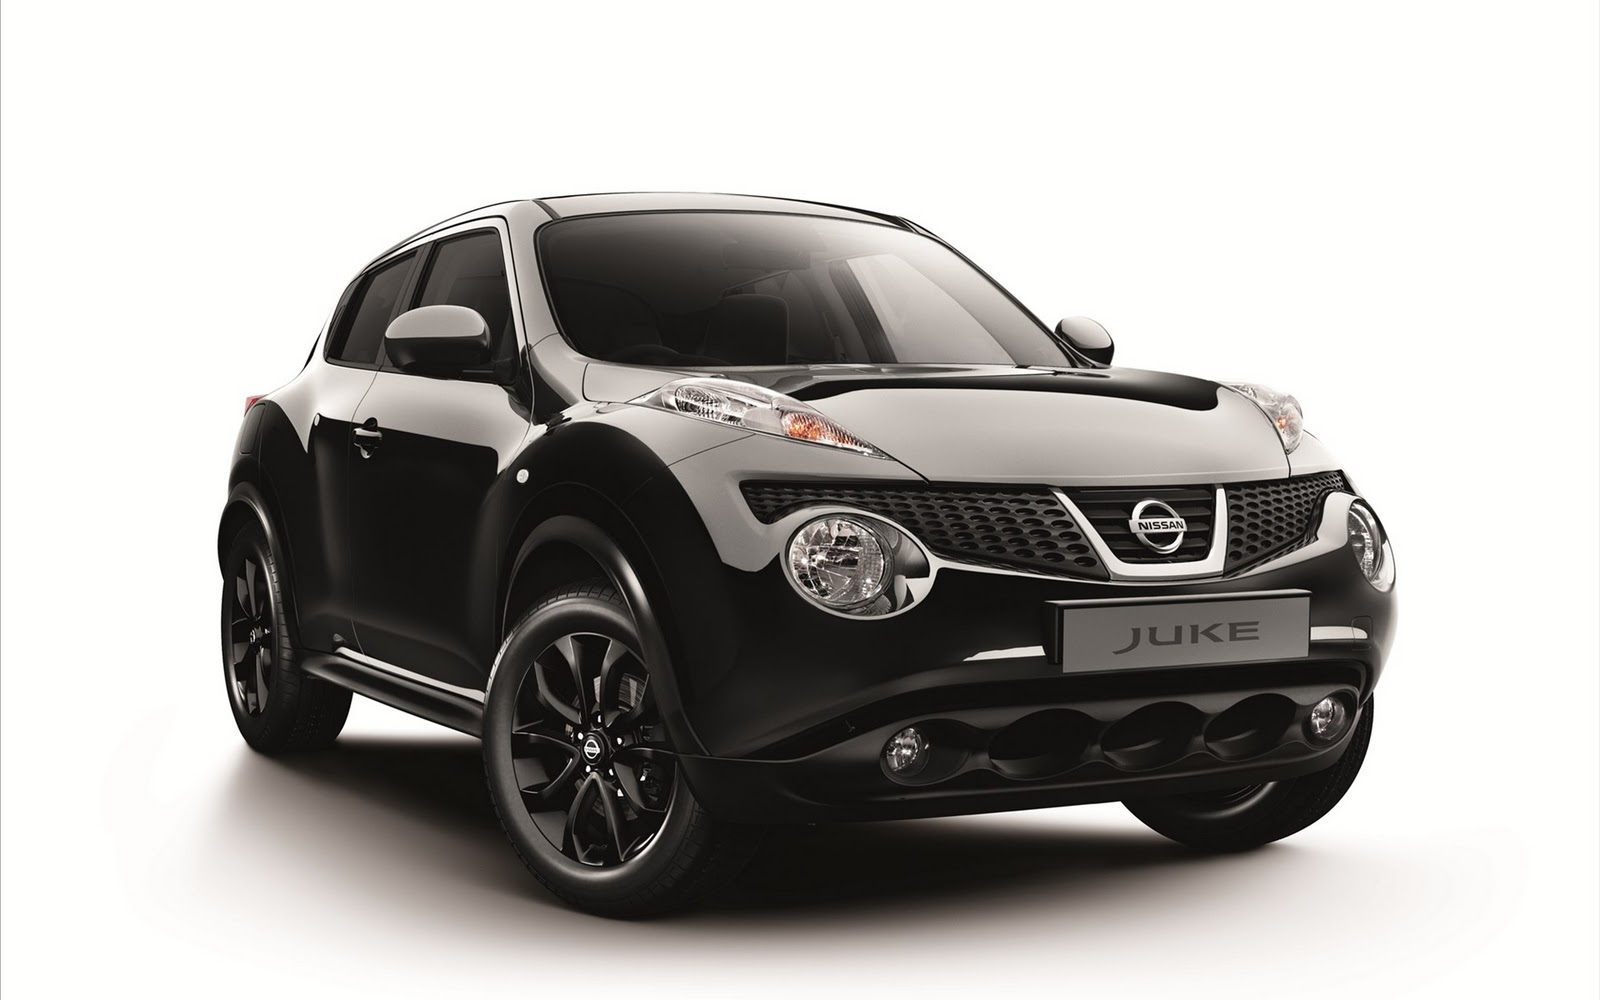 Kendall Self Drive 2012 Nissan Juke Kuro Edition Review